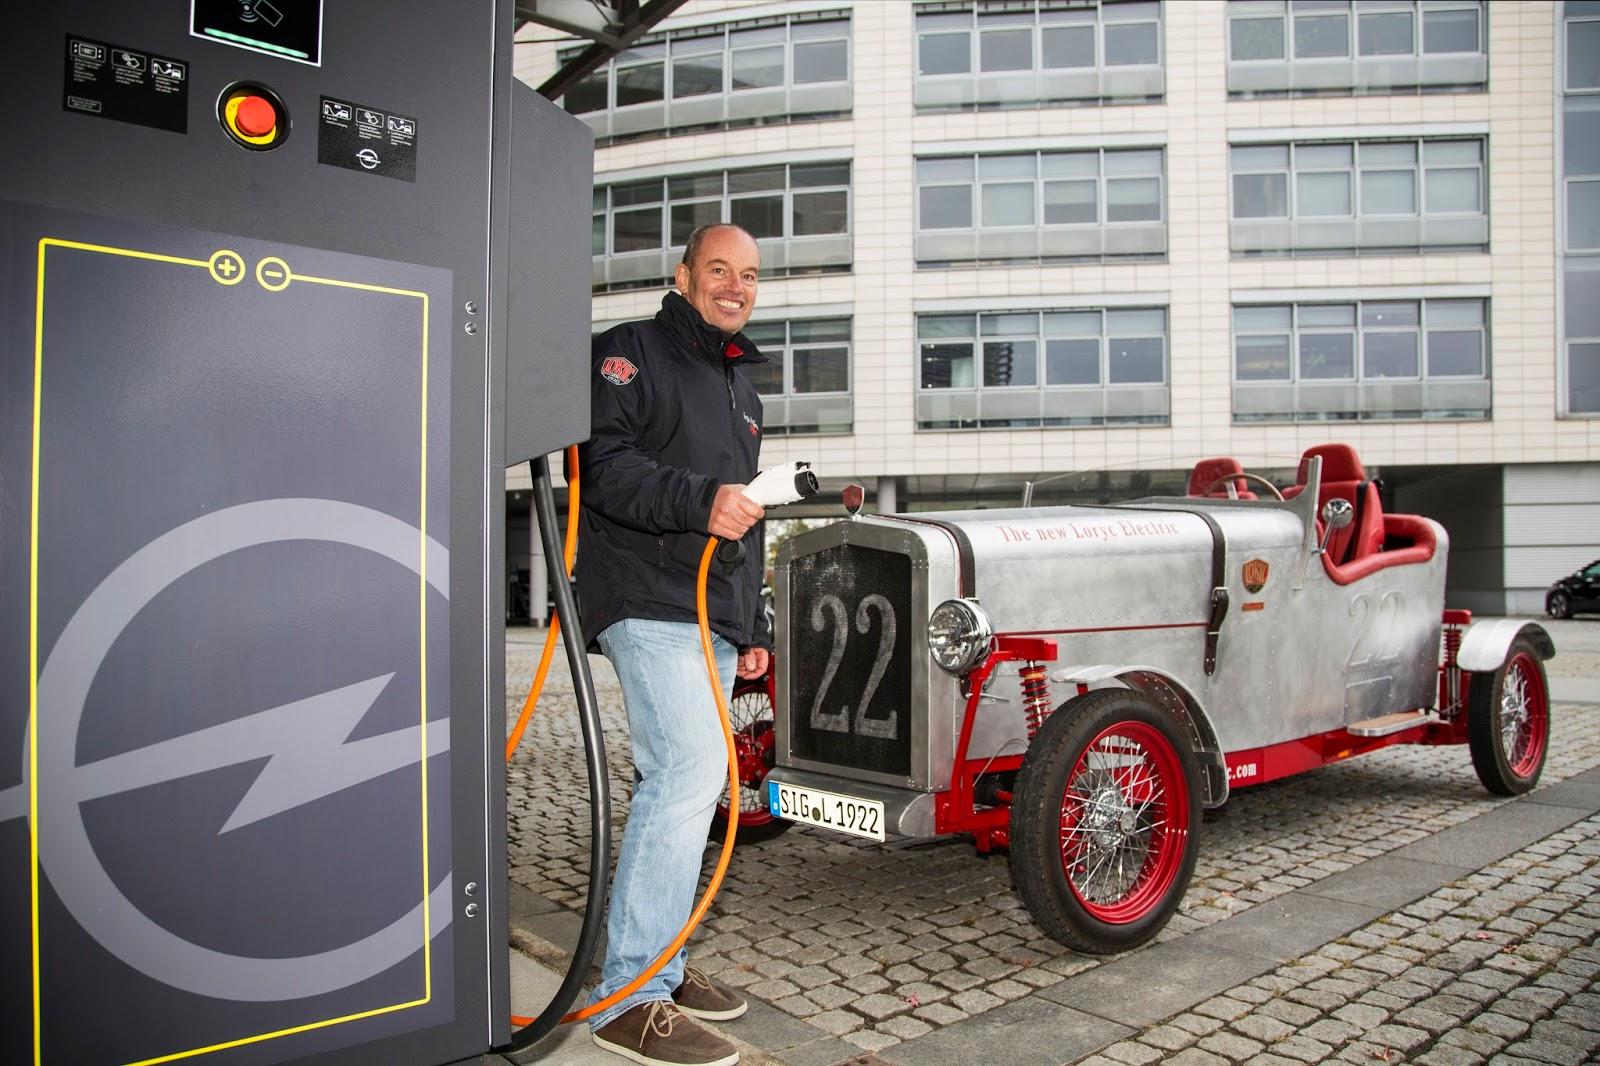 Loryc Electric Speedster 303793 Το Opel Adam δωρίζει τα εξαρτημάτα του και δίνει ζωή στο Loryc Electric Speedster Electric cars, Loryc, Opel, Opel ADAM